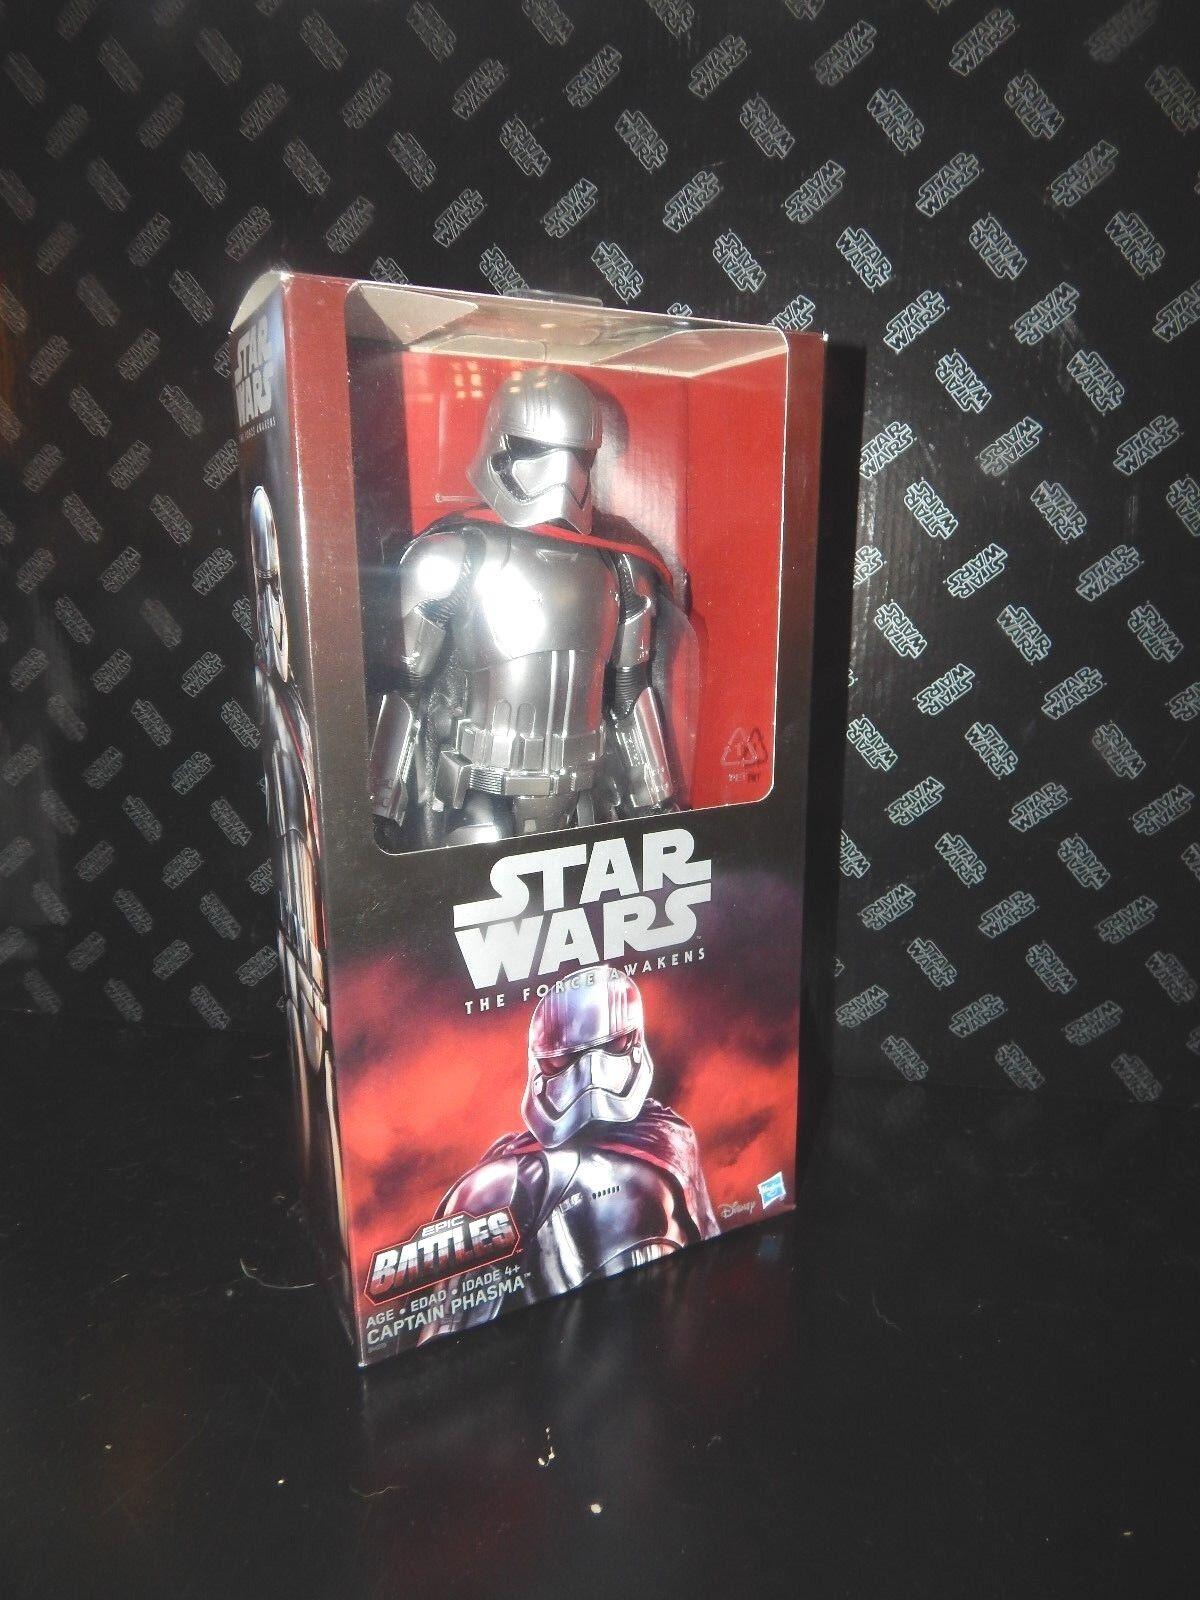 Star Wars 12 12 12   Inch Scale Captain Phasma da3bdf